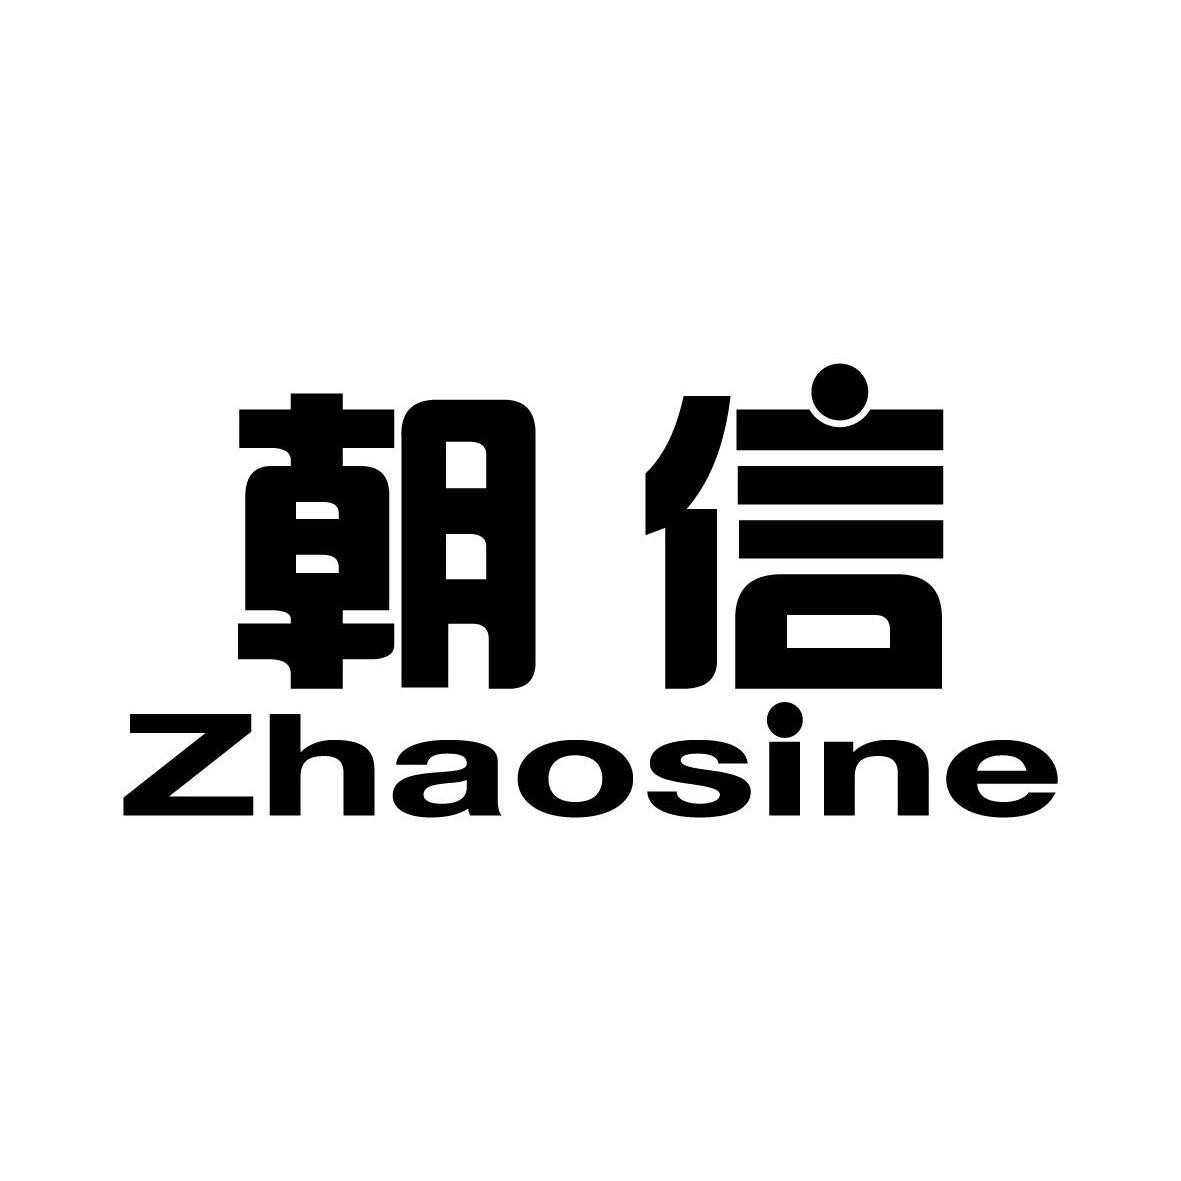 朝信ZHAOSINE